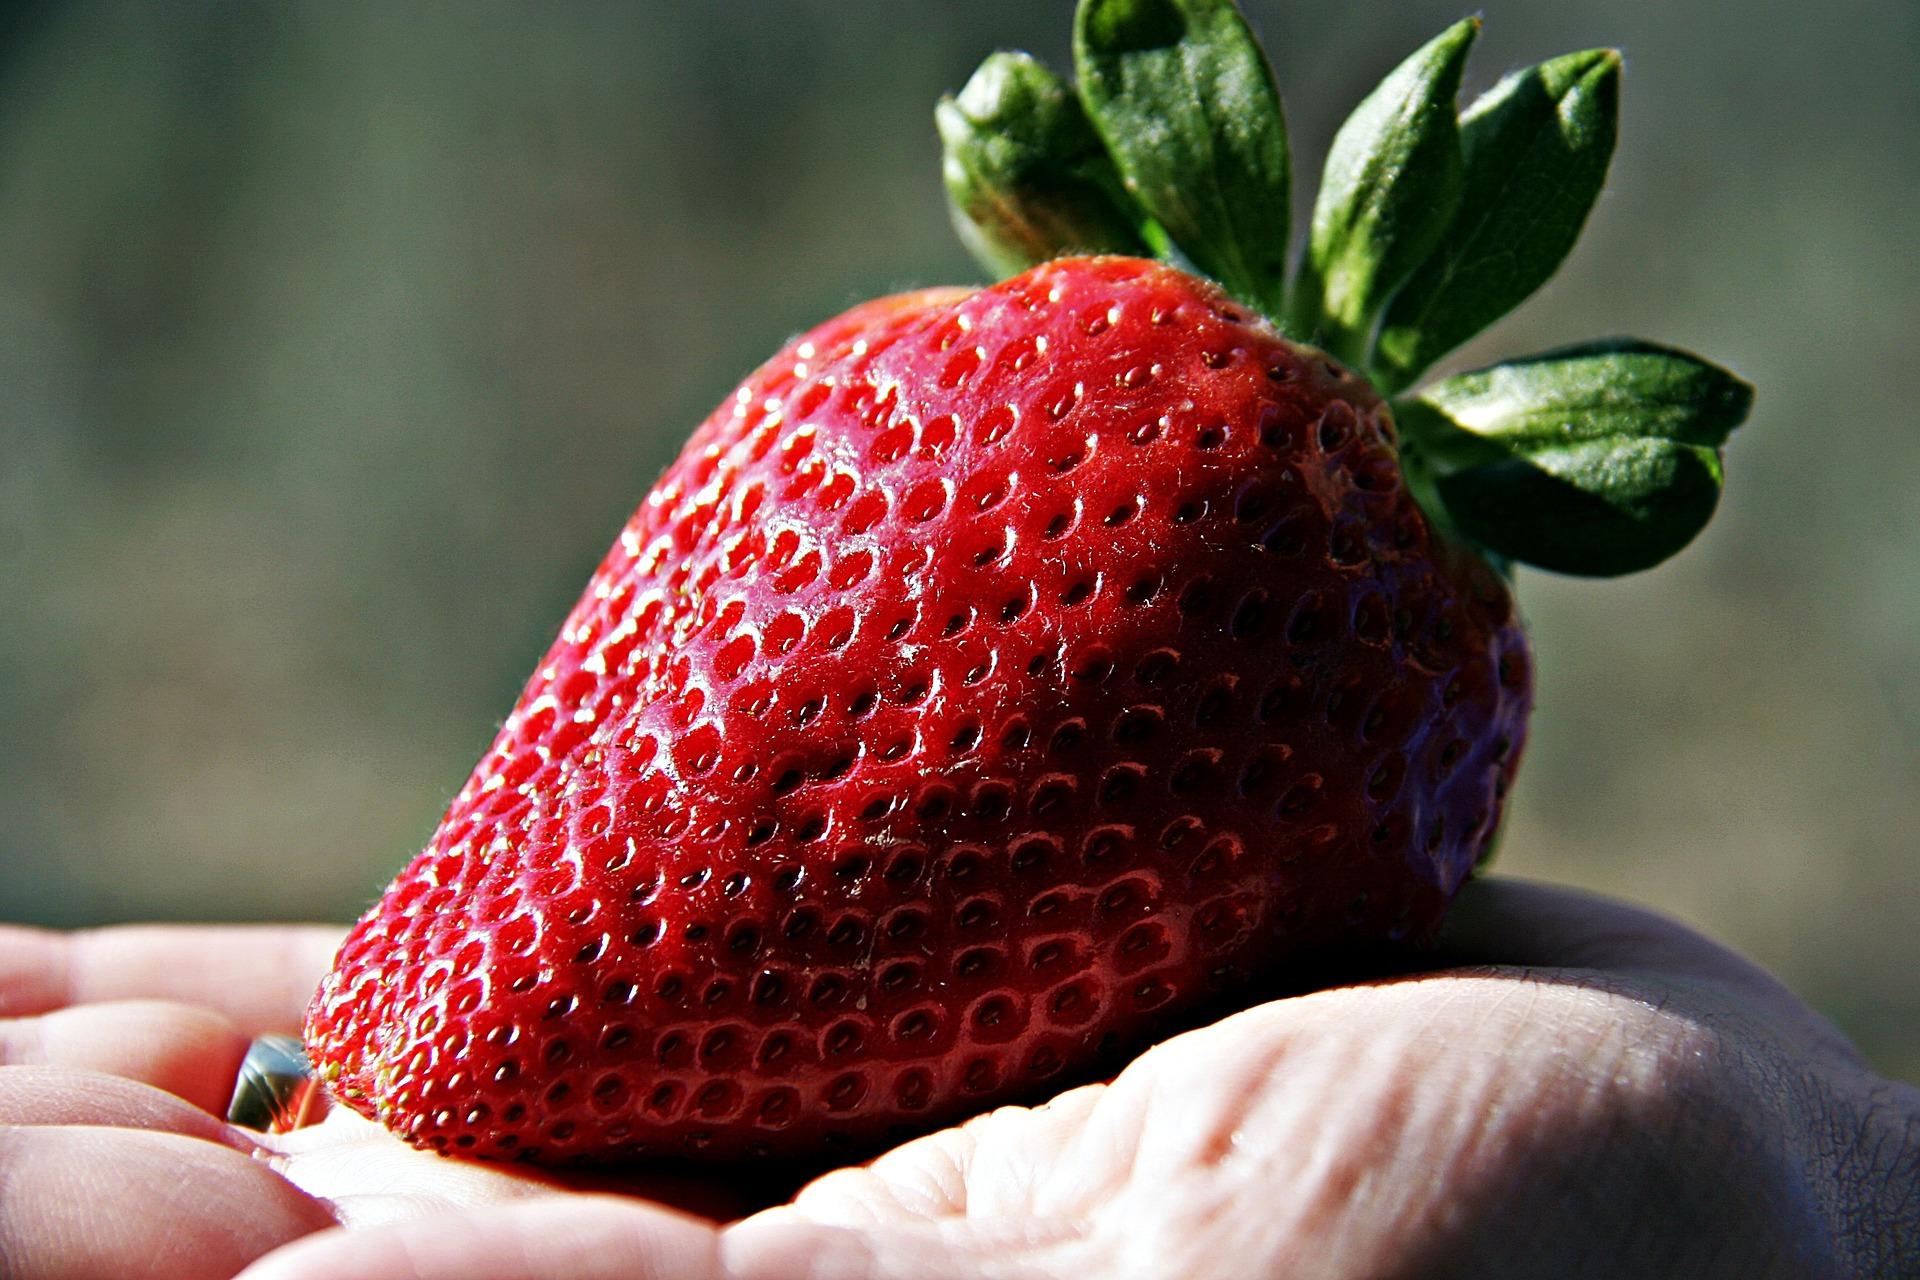 strawberry-1301245_1920.jpg